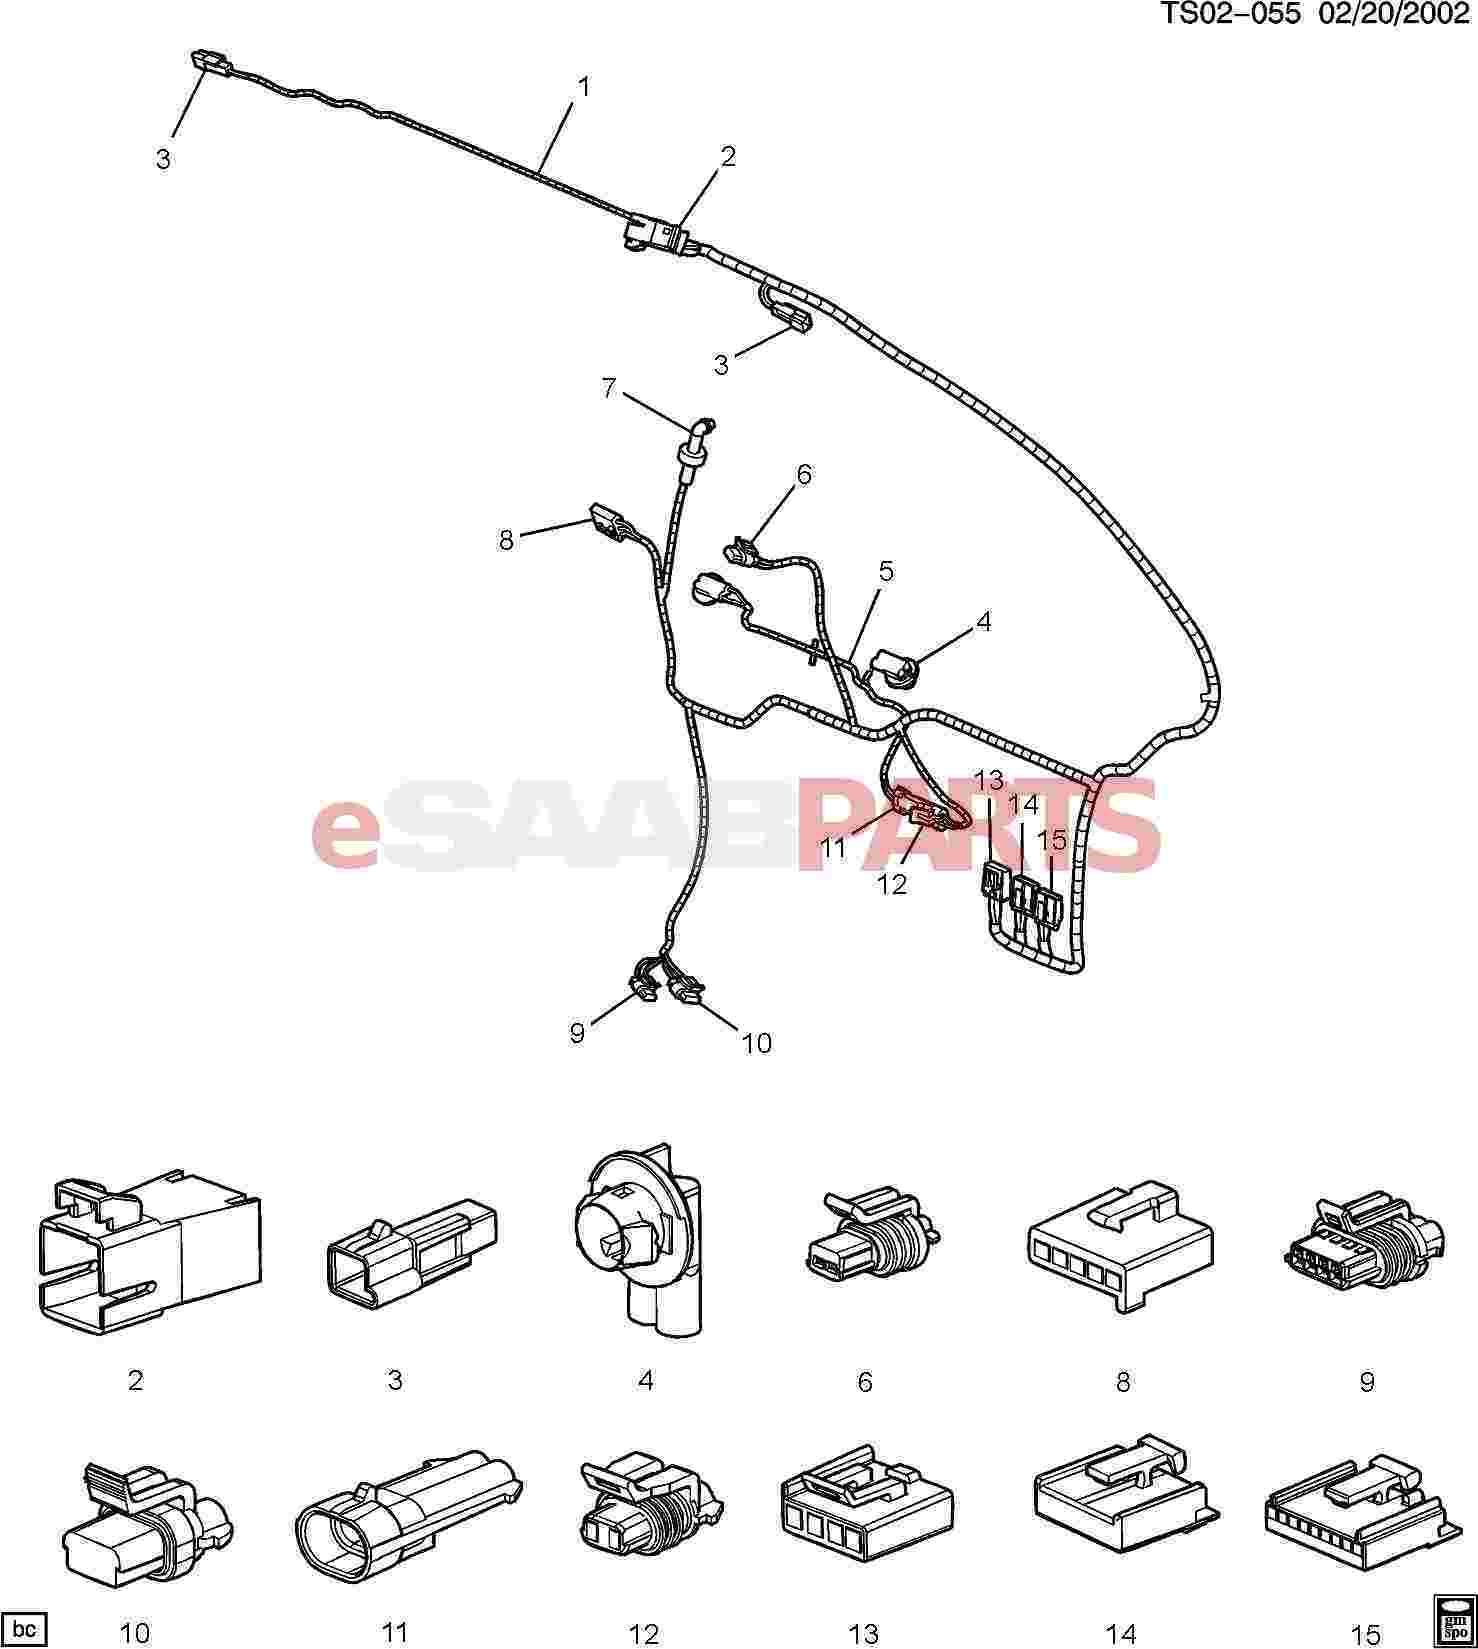 Saab Connector Mdl Dr Lk Cont